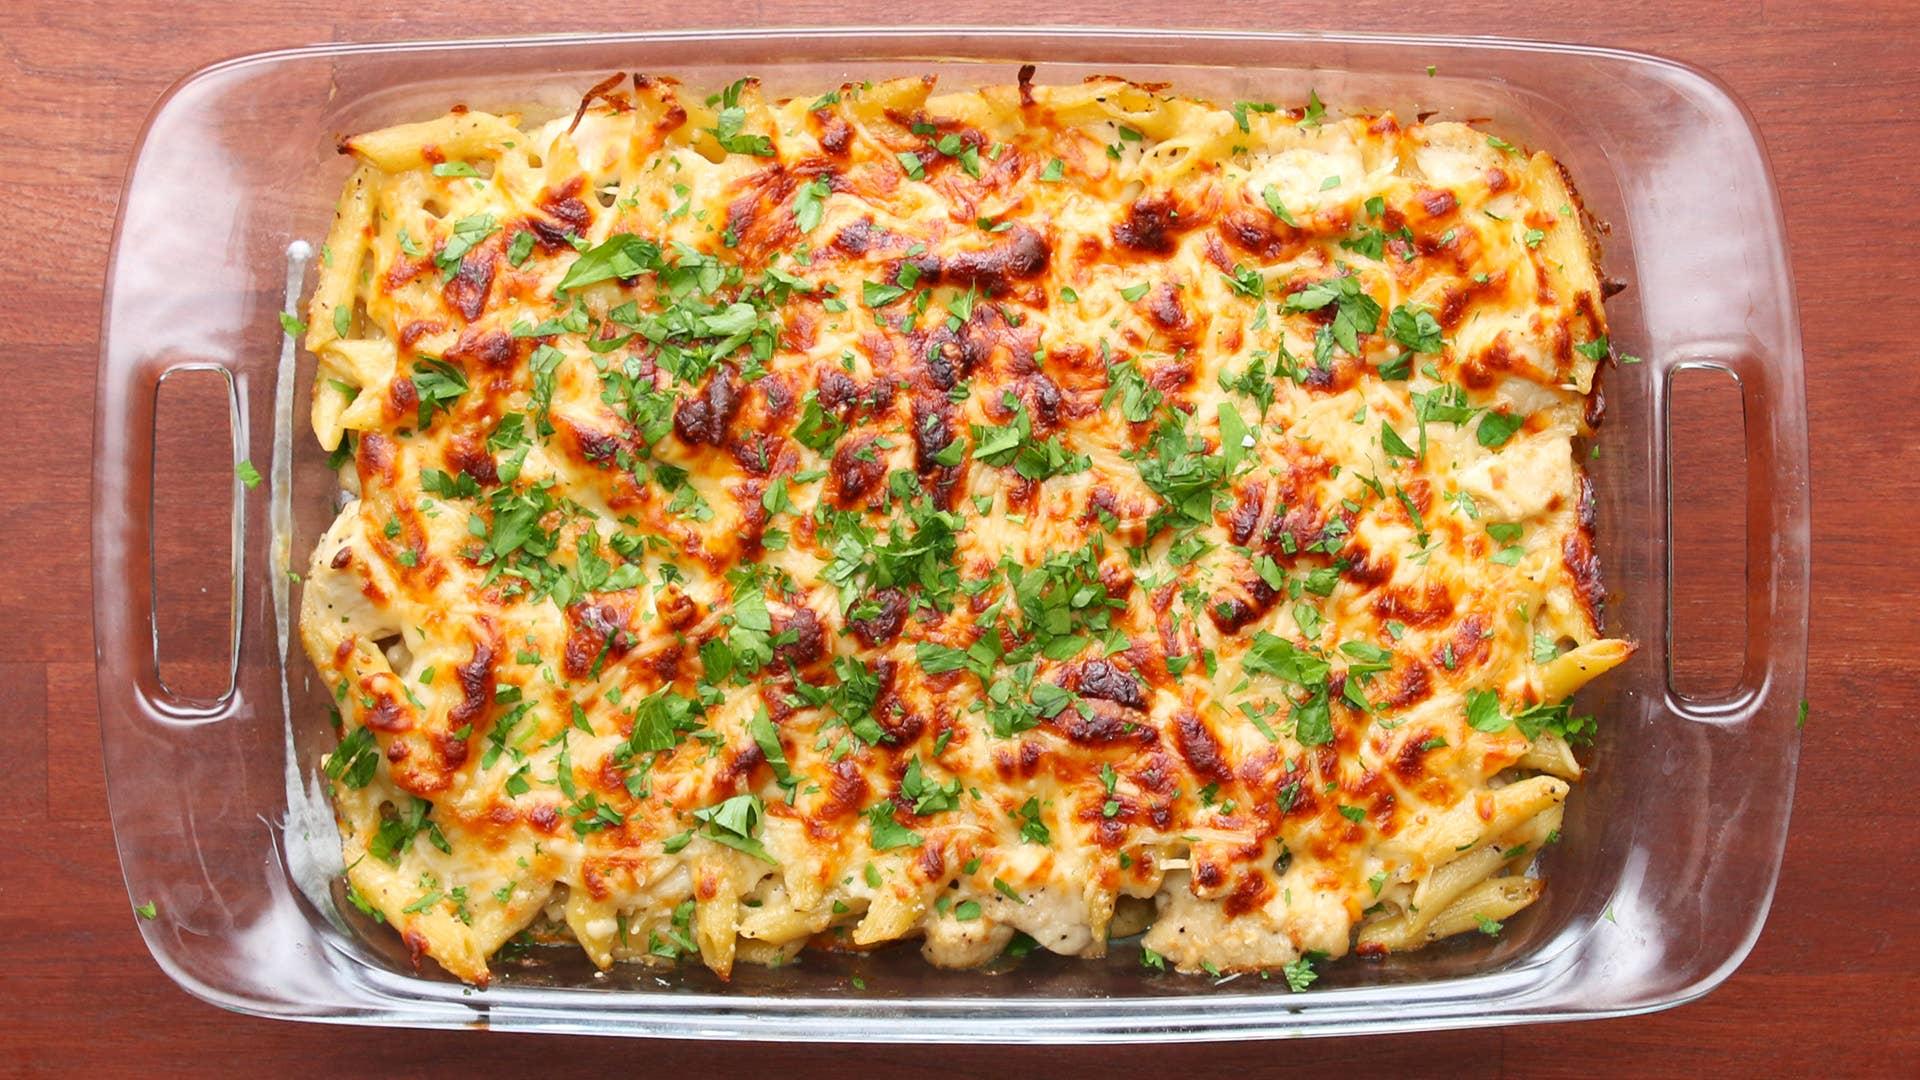 Cheesy Chicken Alfredo Pasta Bake Recipe by Tasty